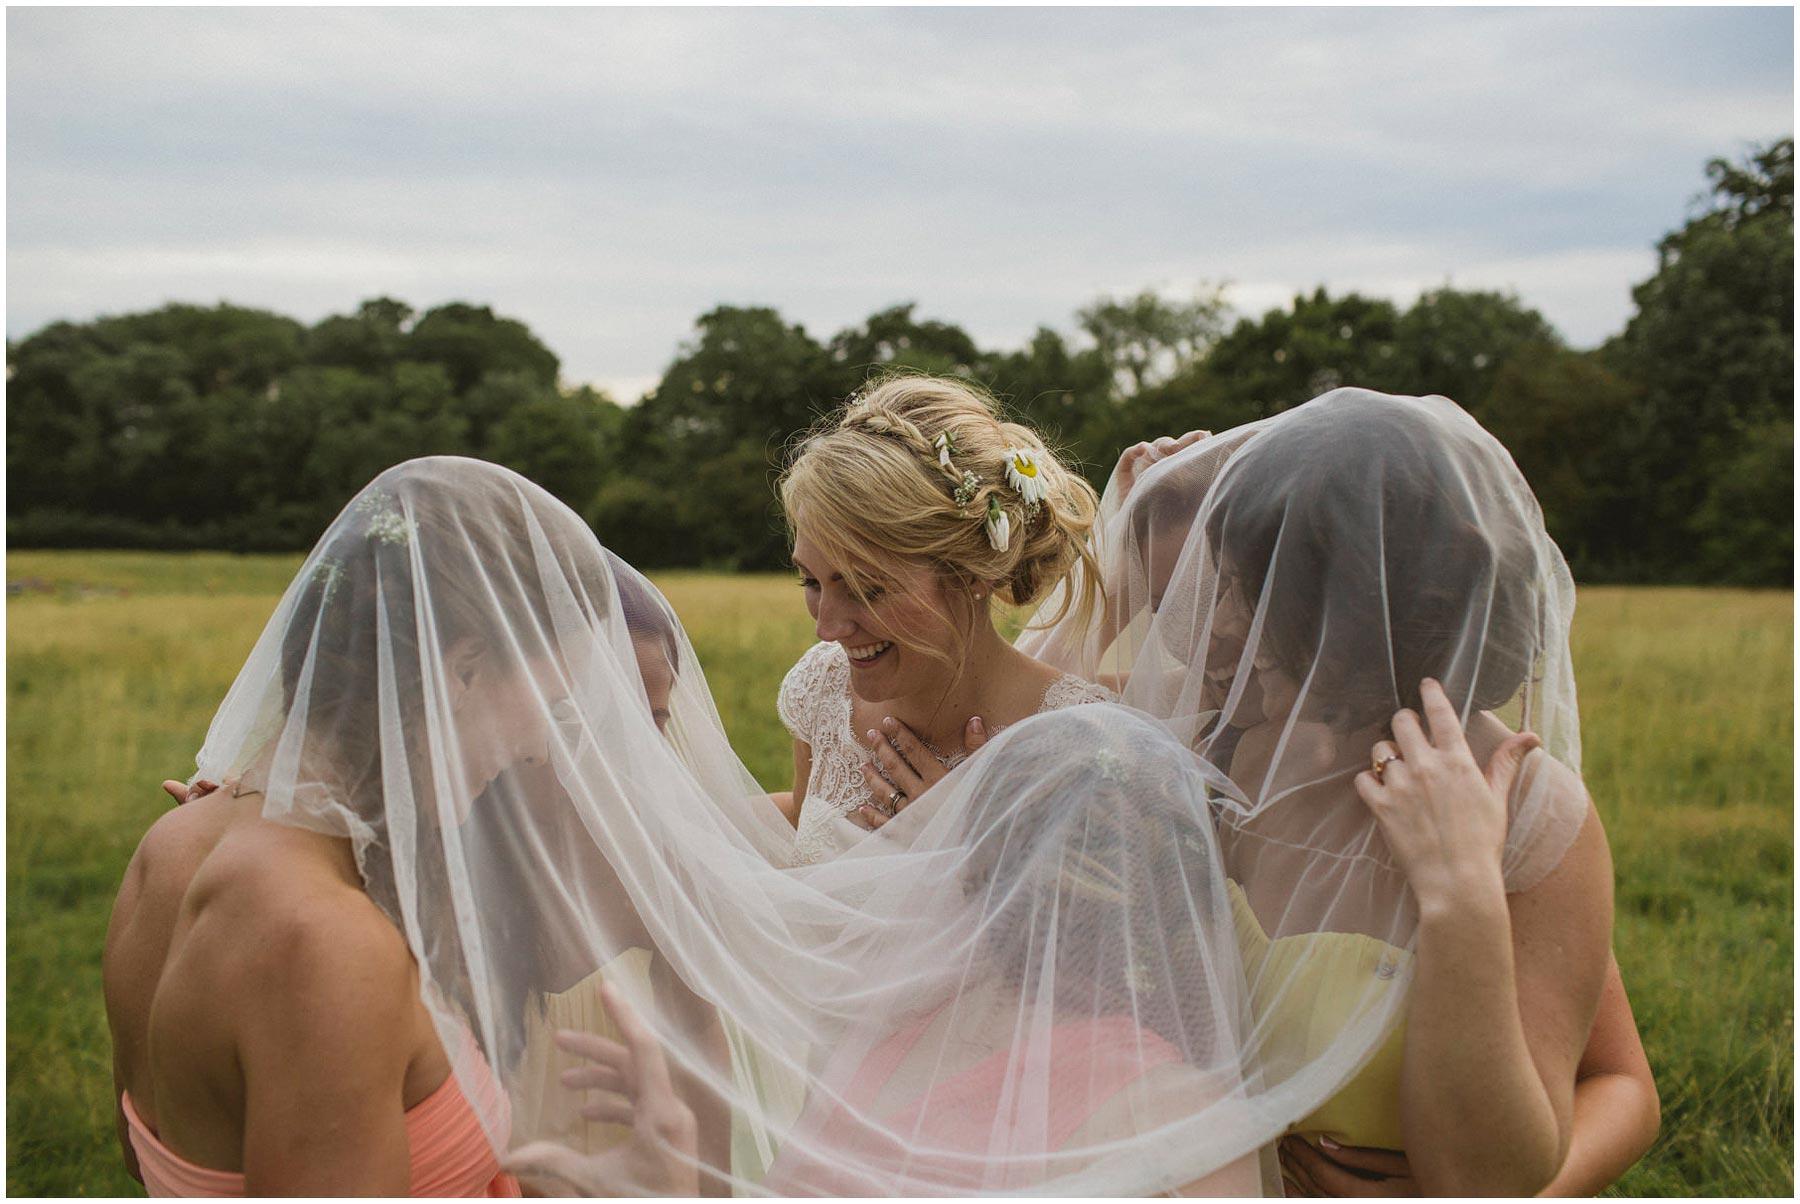 Kent-Festival-Tipi-wedding-photography_0158